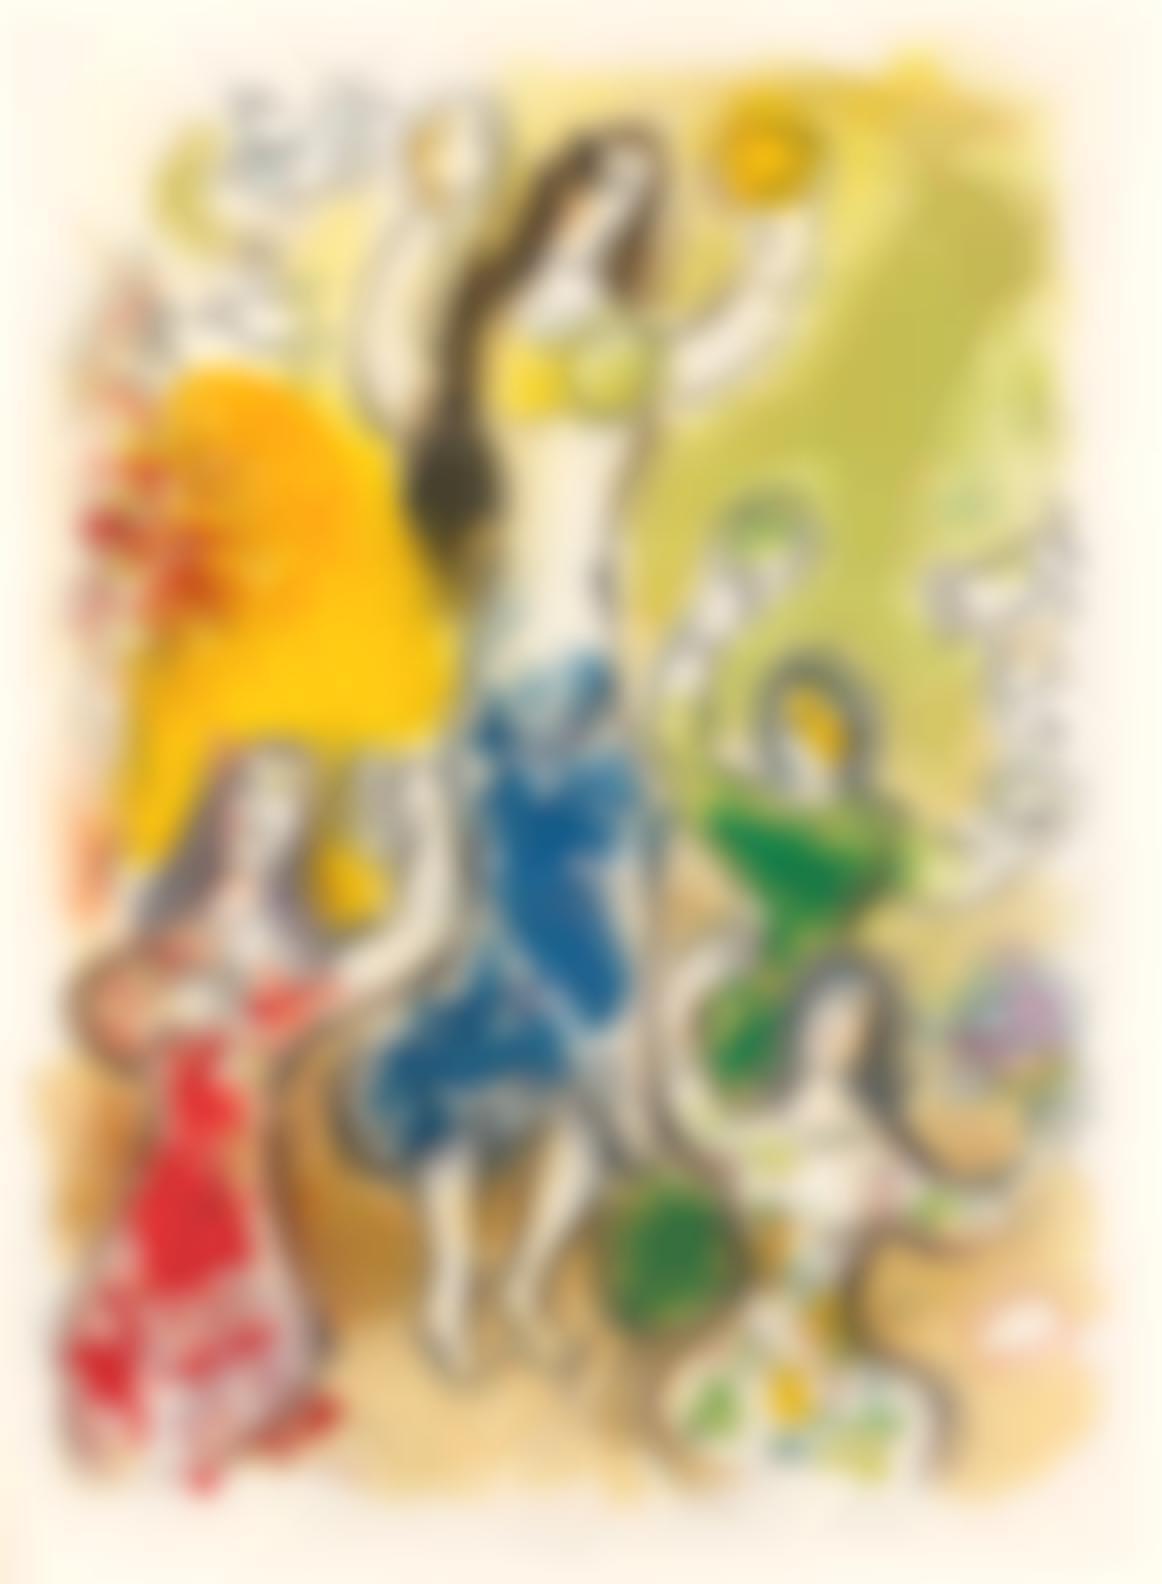 Marc Chagall-The Story Of The Exodus, Leon Amiel, Paris-New York, 1966 (Cramer Books 64; Mourlot 444-467)-1966